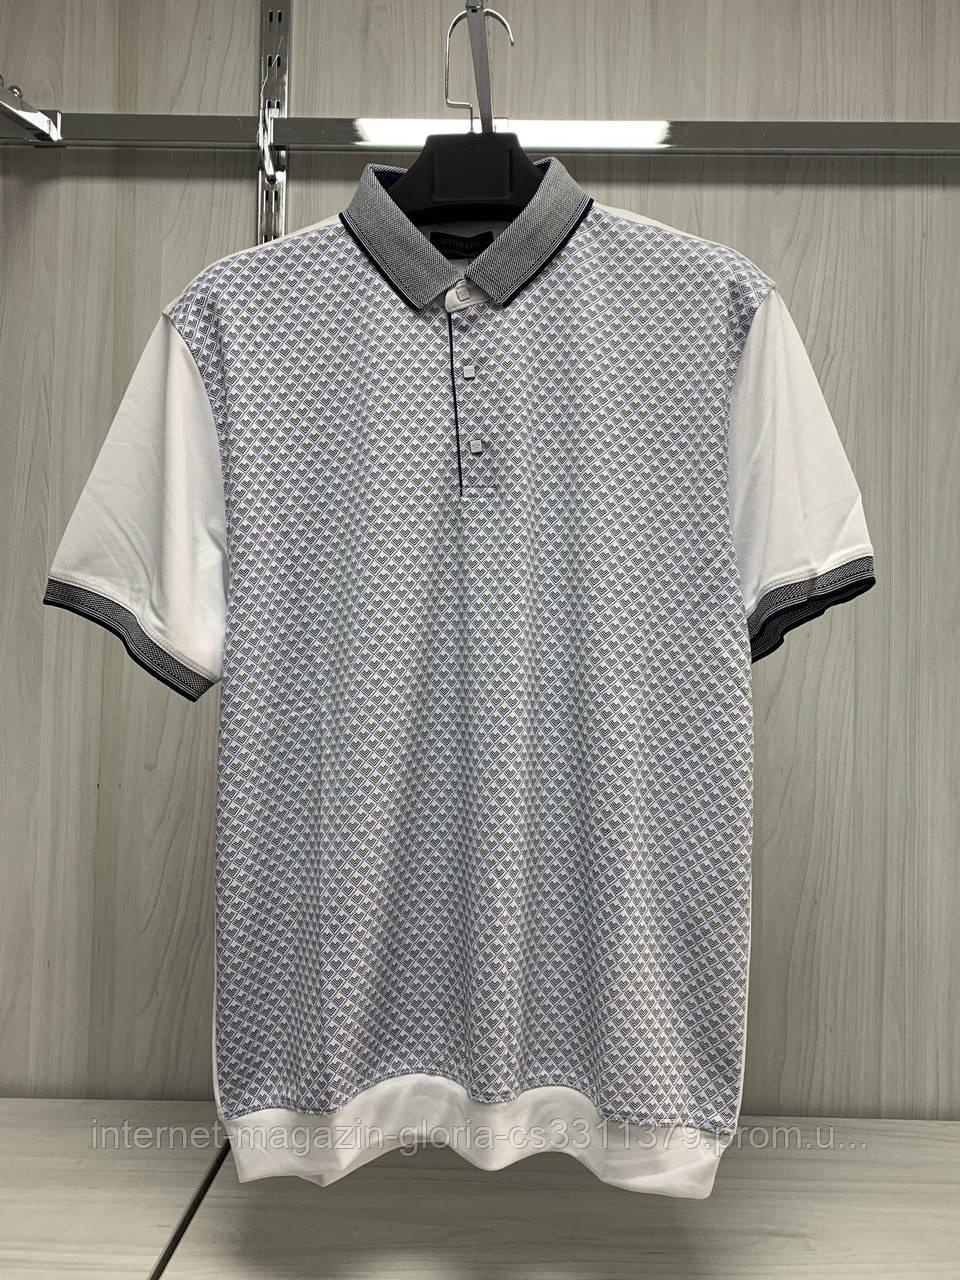 Мужская футболка поло Better Life. 127. Размеры: M,L,XL,XXL.